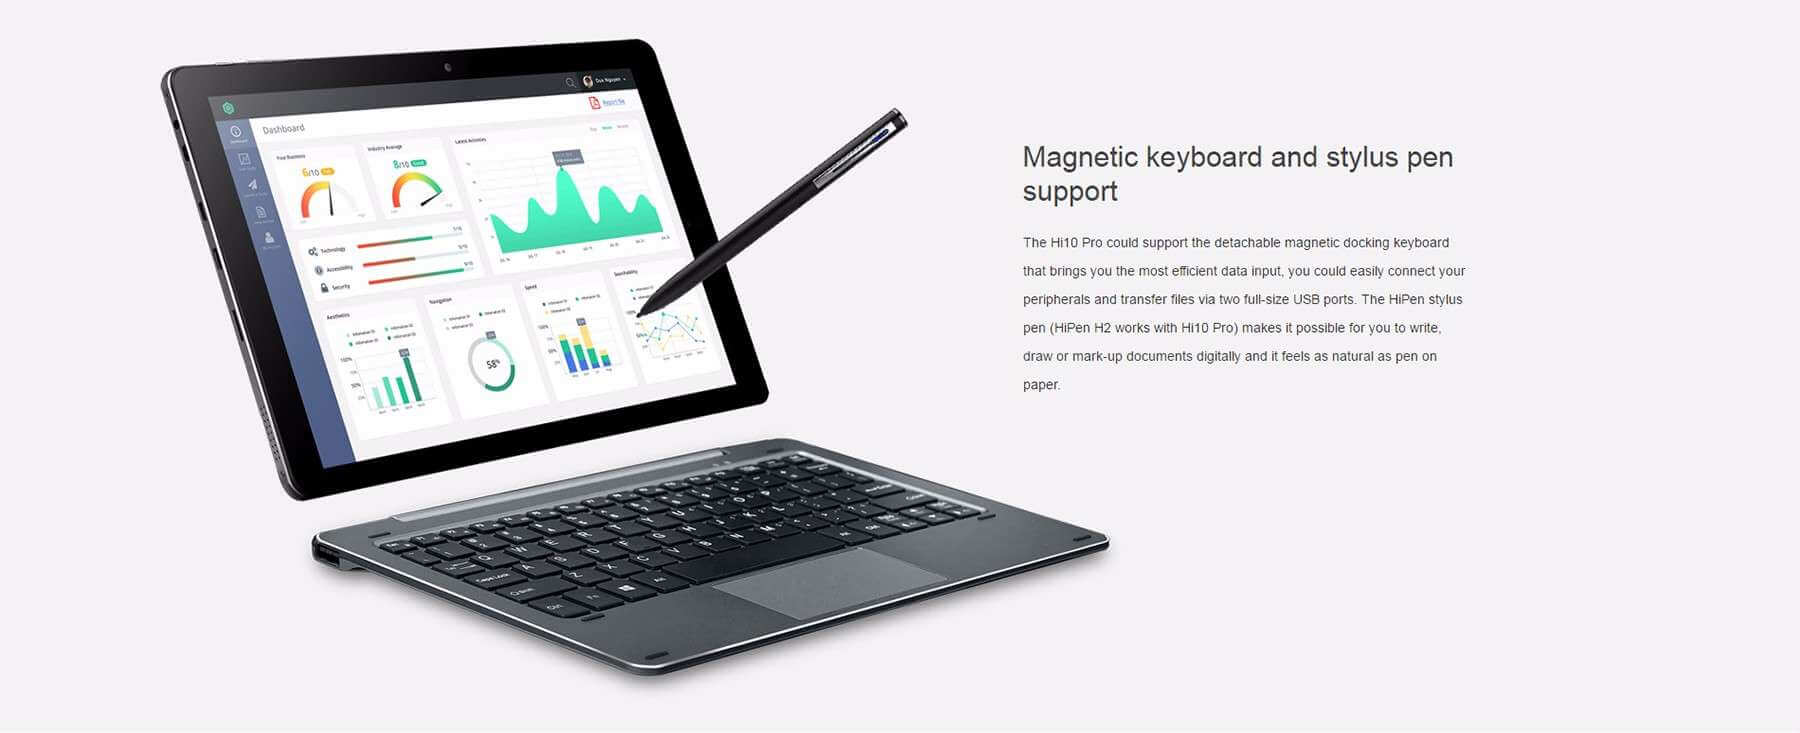 CHUWI Hi10 Pro Megic Keyboard